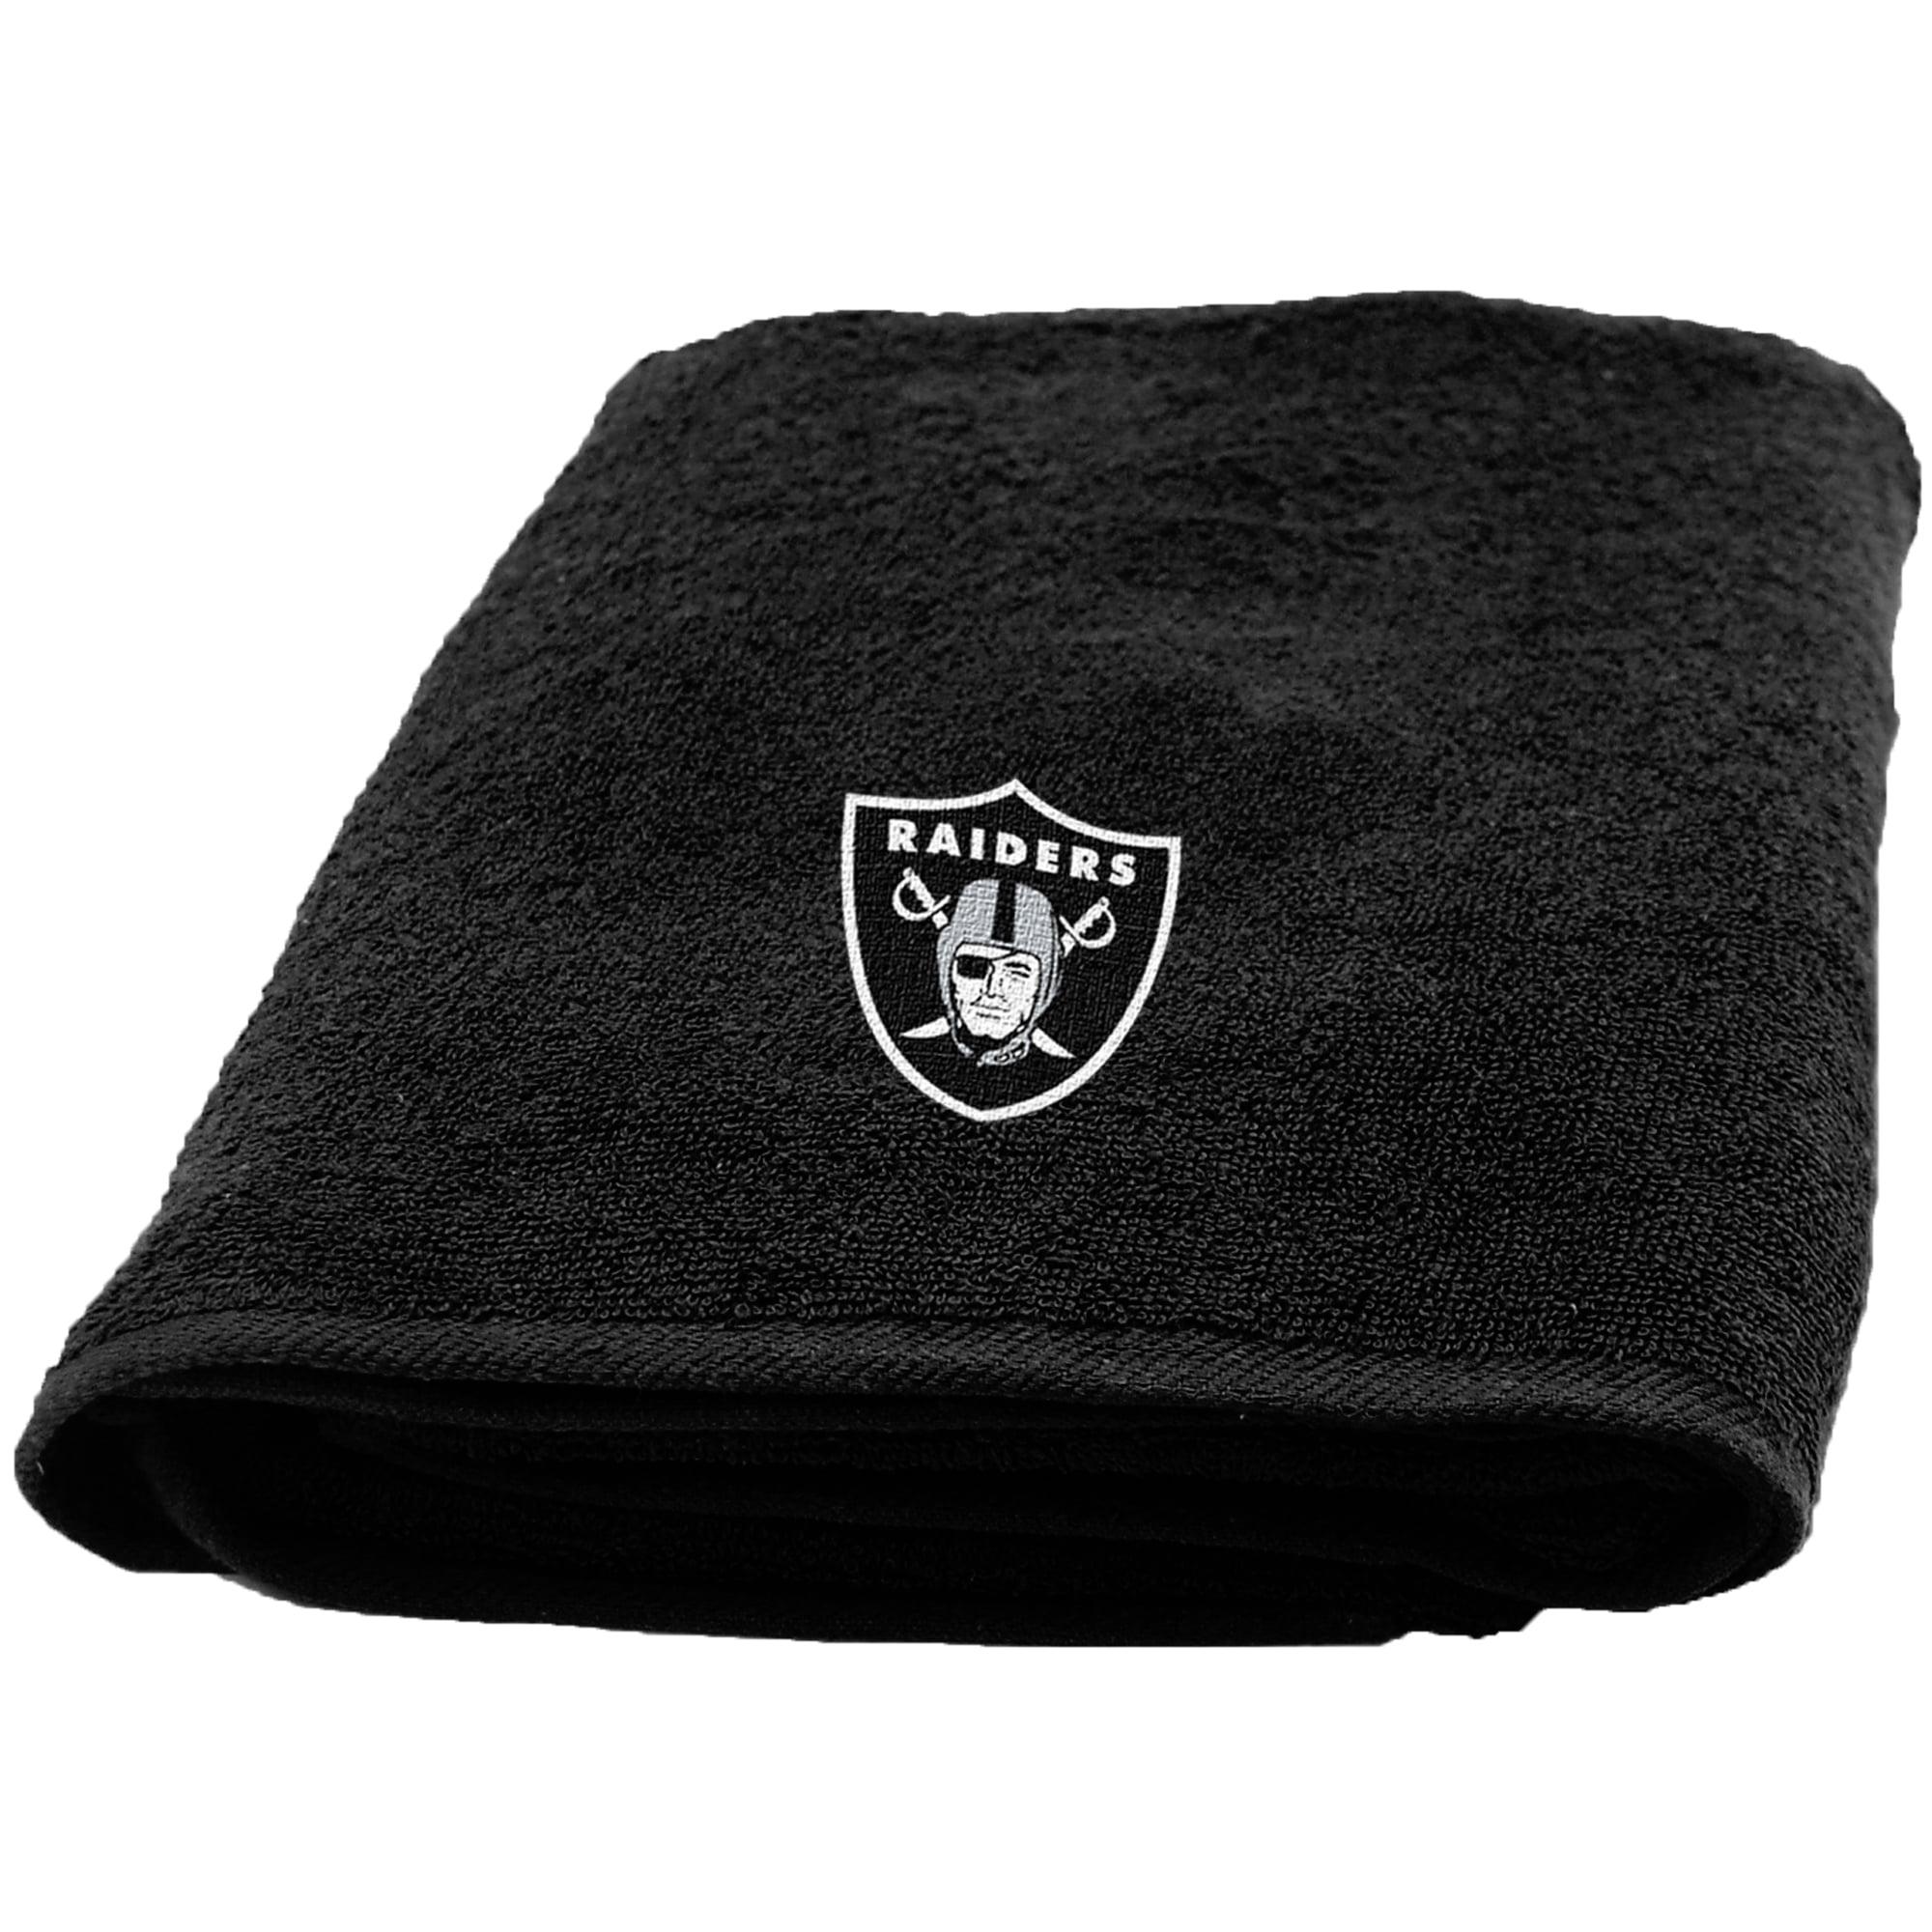 NFL Oakland Raiders Bath Towel, 1 Each